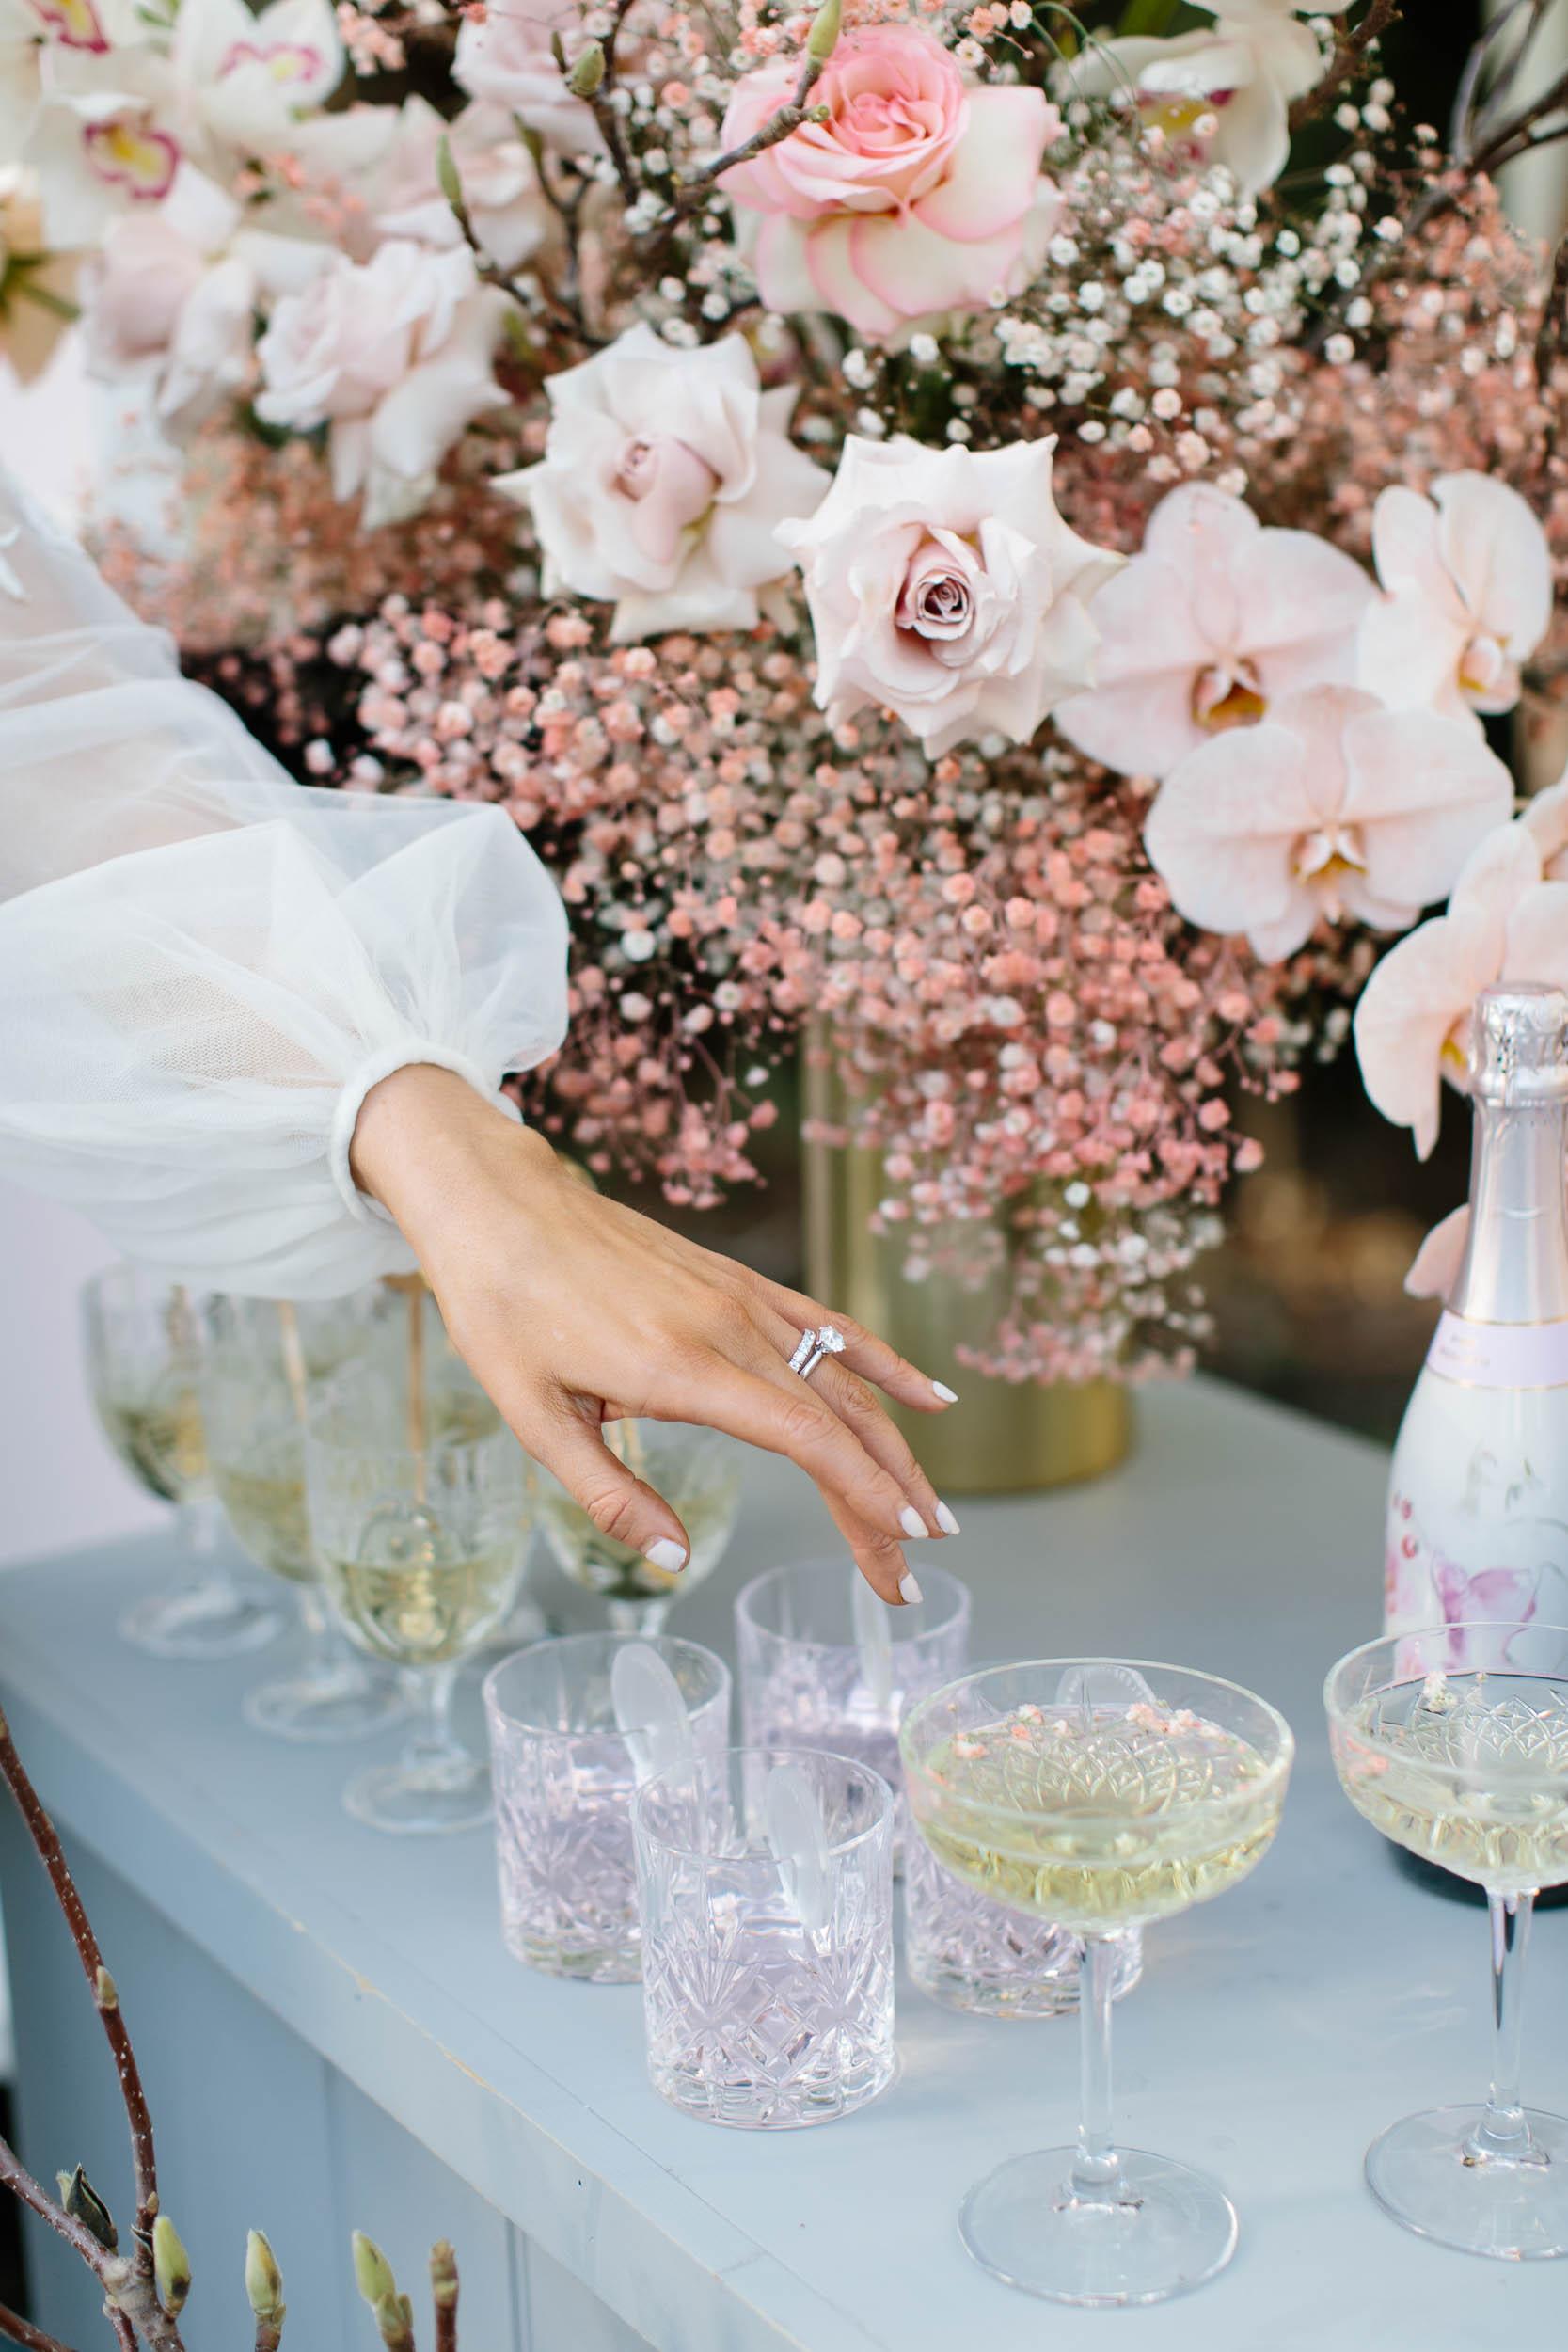 Kas-Richards-LENZO-Yarra-Valley-Wedding-One-Day-Bridal-212.jpg